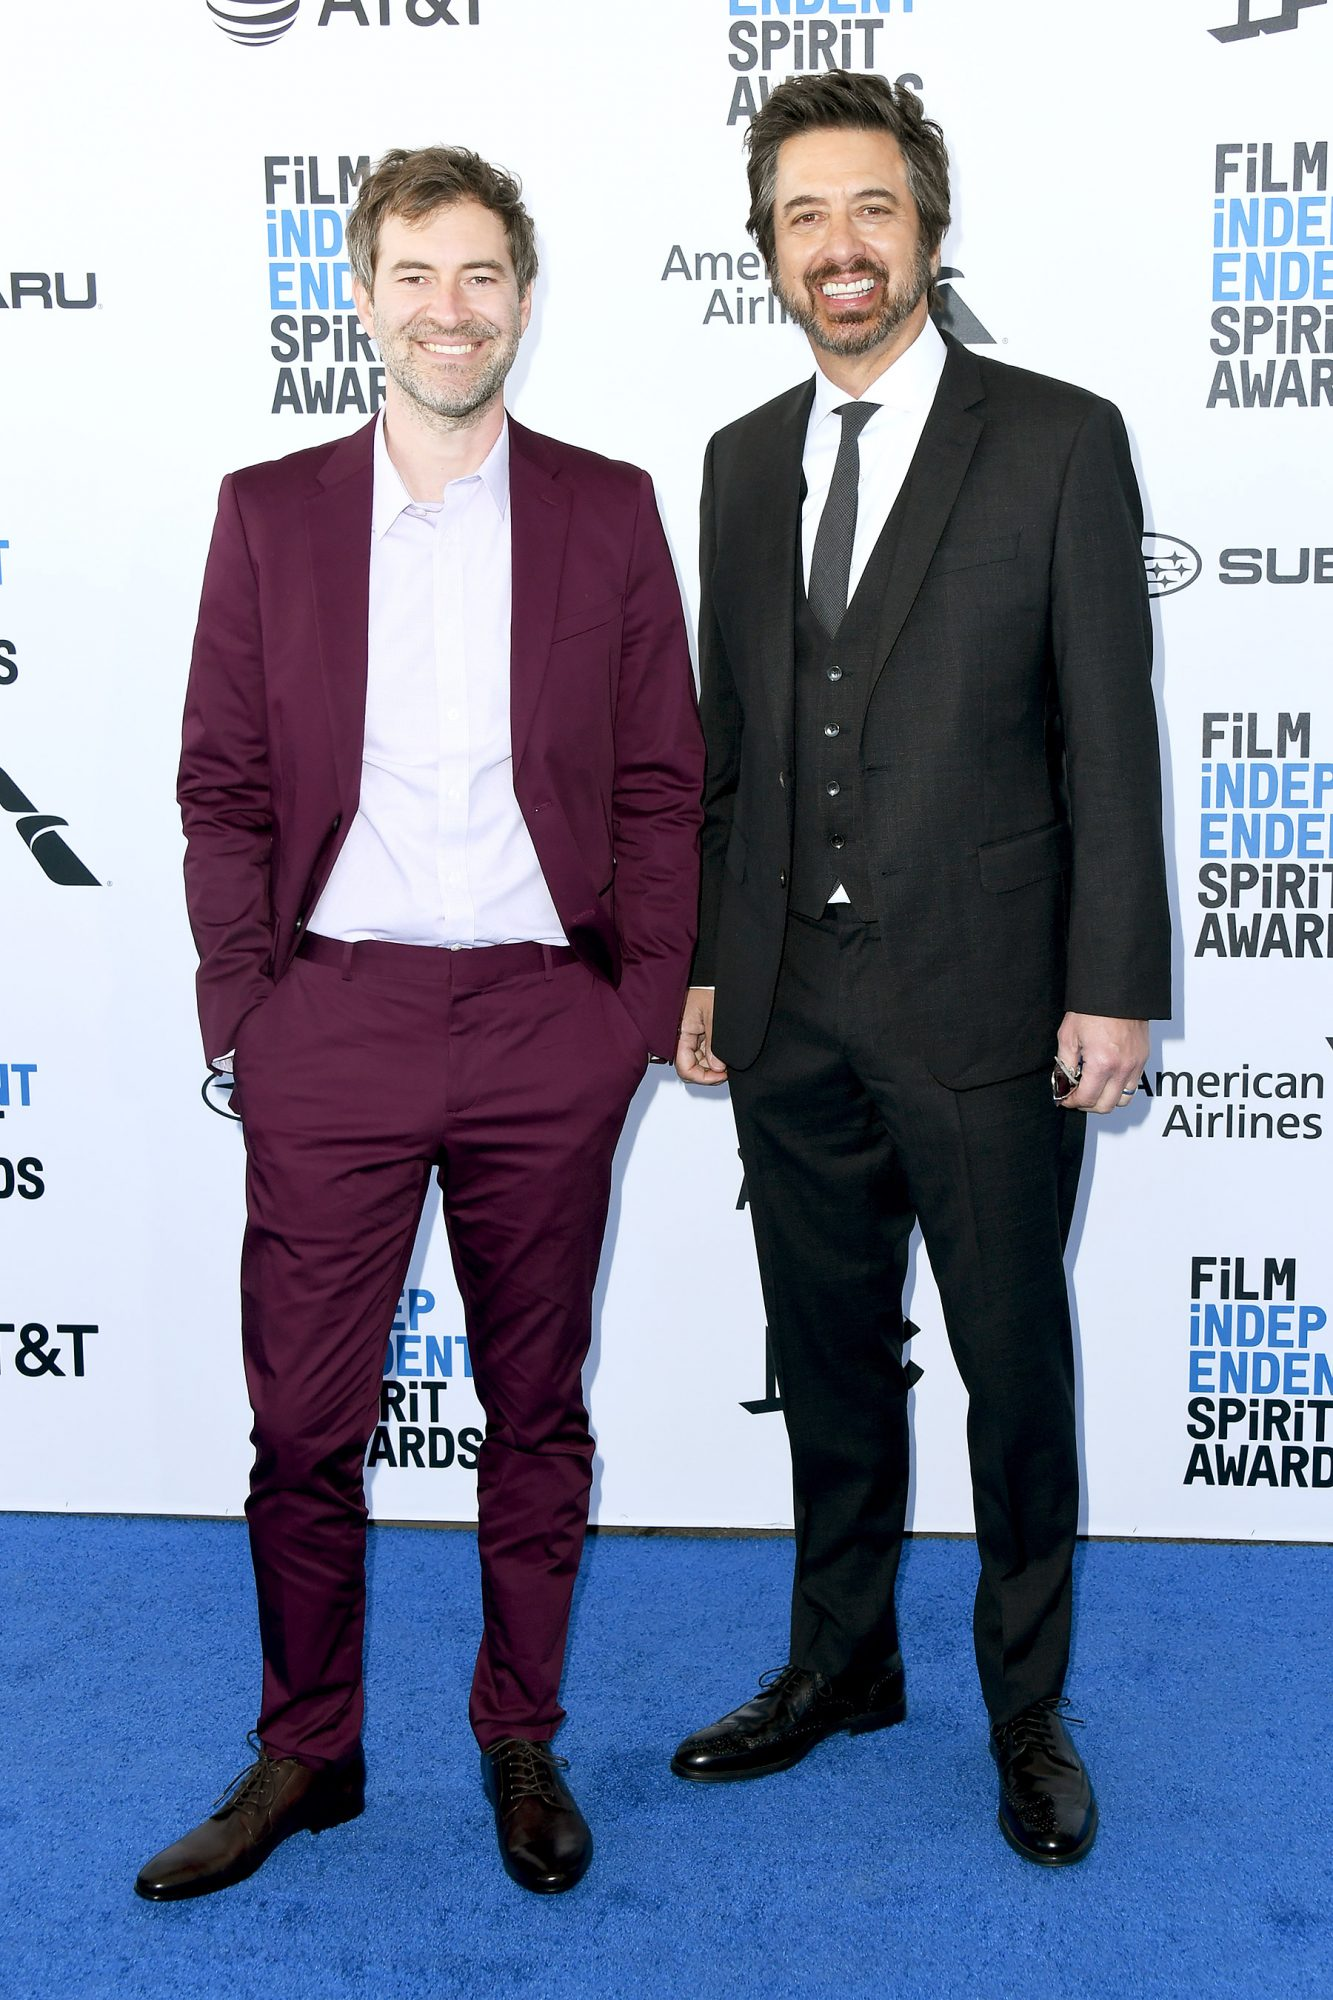 2019 Film Independent Spirit Awards  - Arrivals